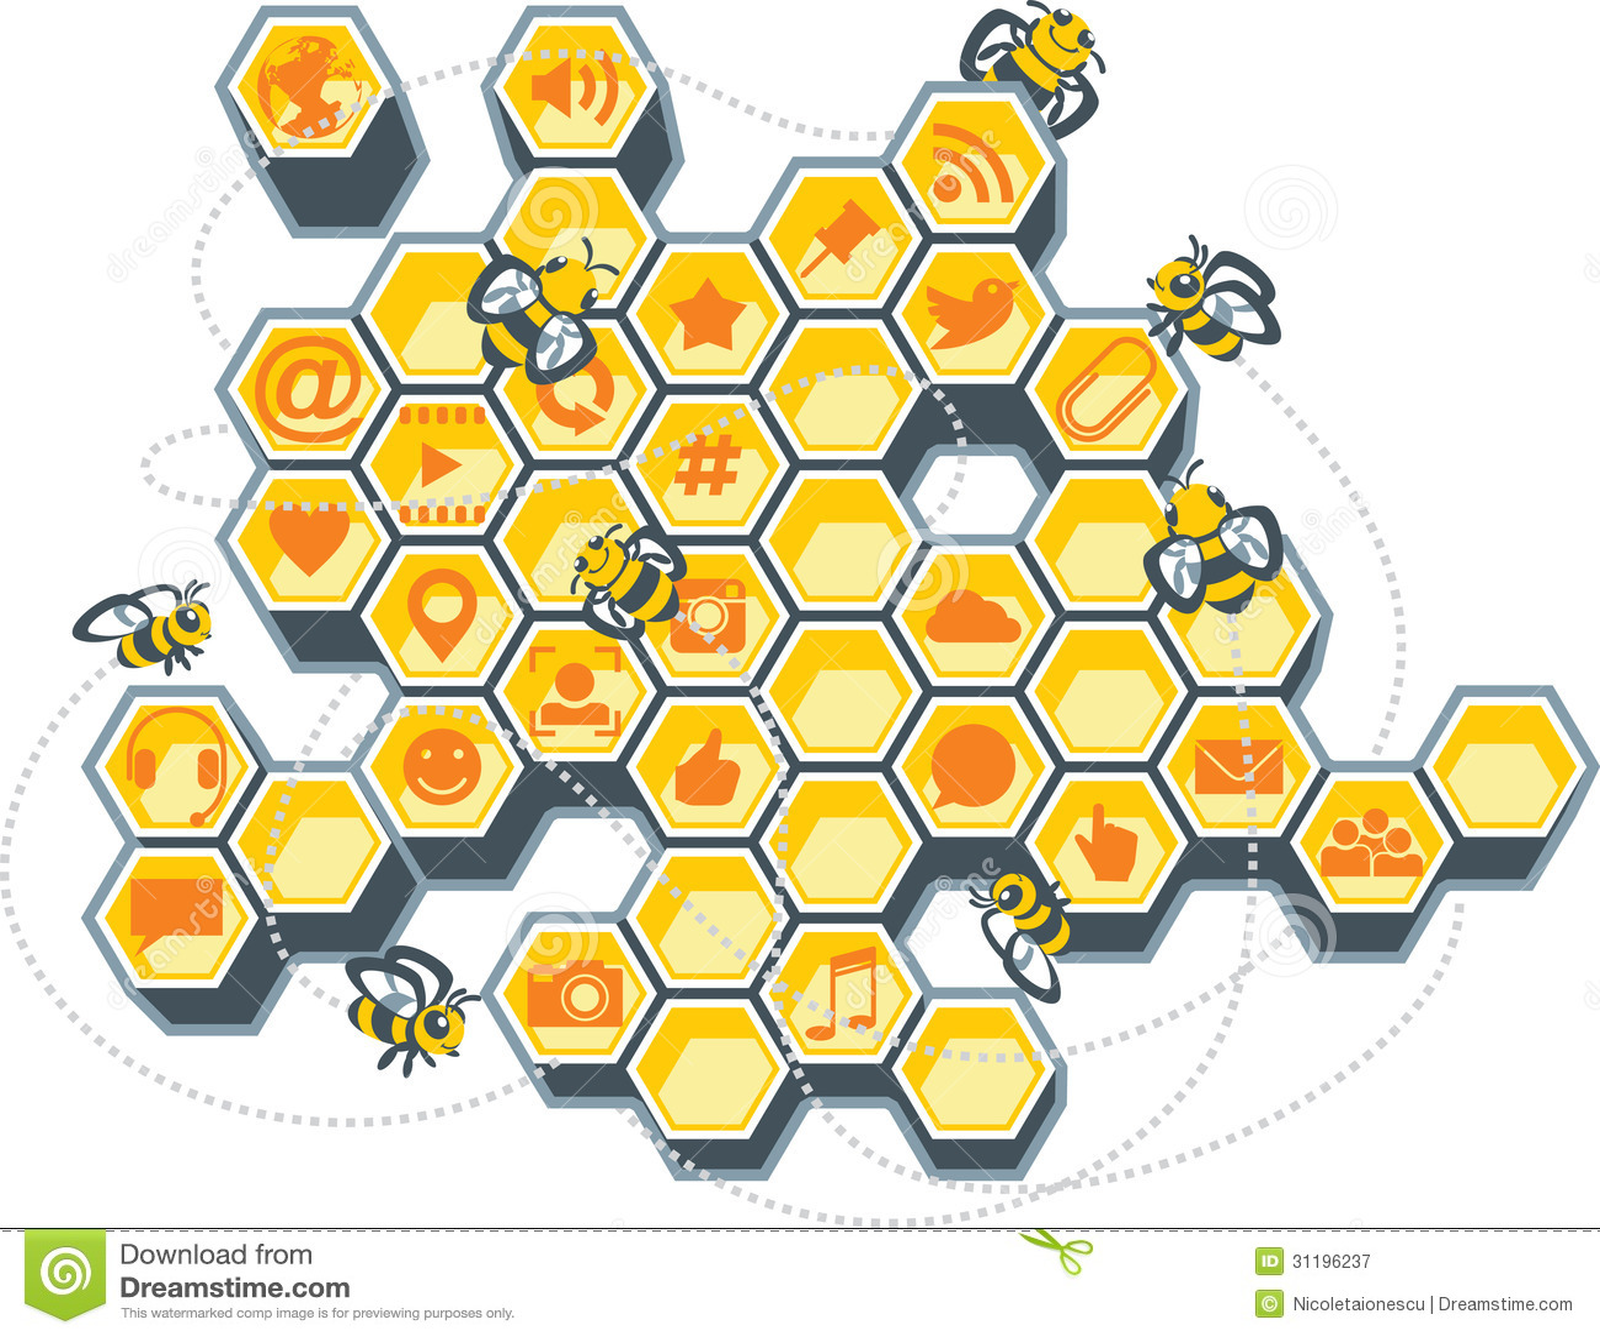 beehive business plan